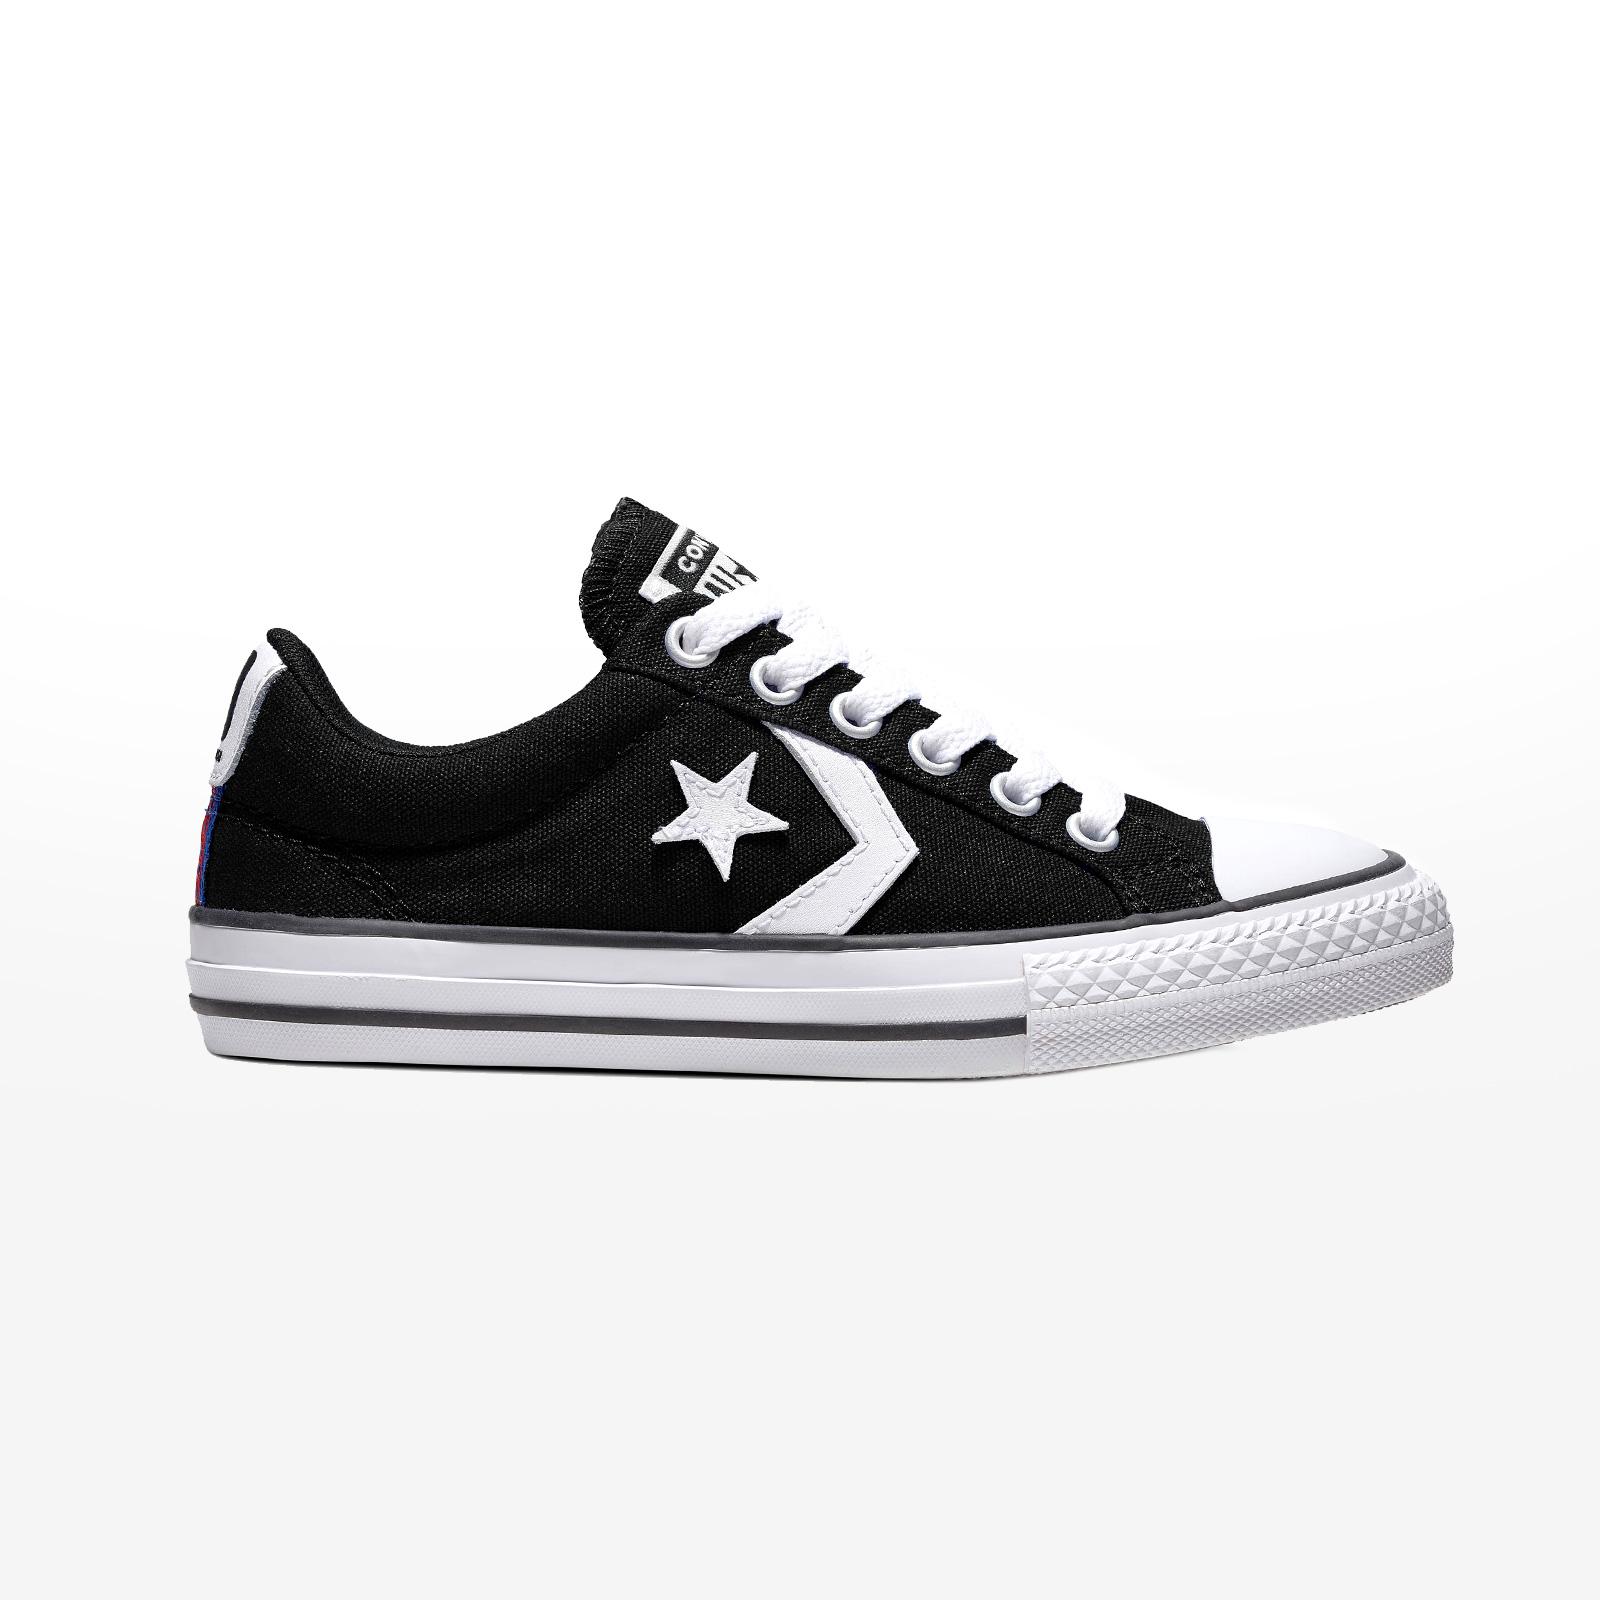 40a07f31a69 Sportcafe Converse – 663656C STAR PLAYER EV OX FOOTWEAR – 001/0871